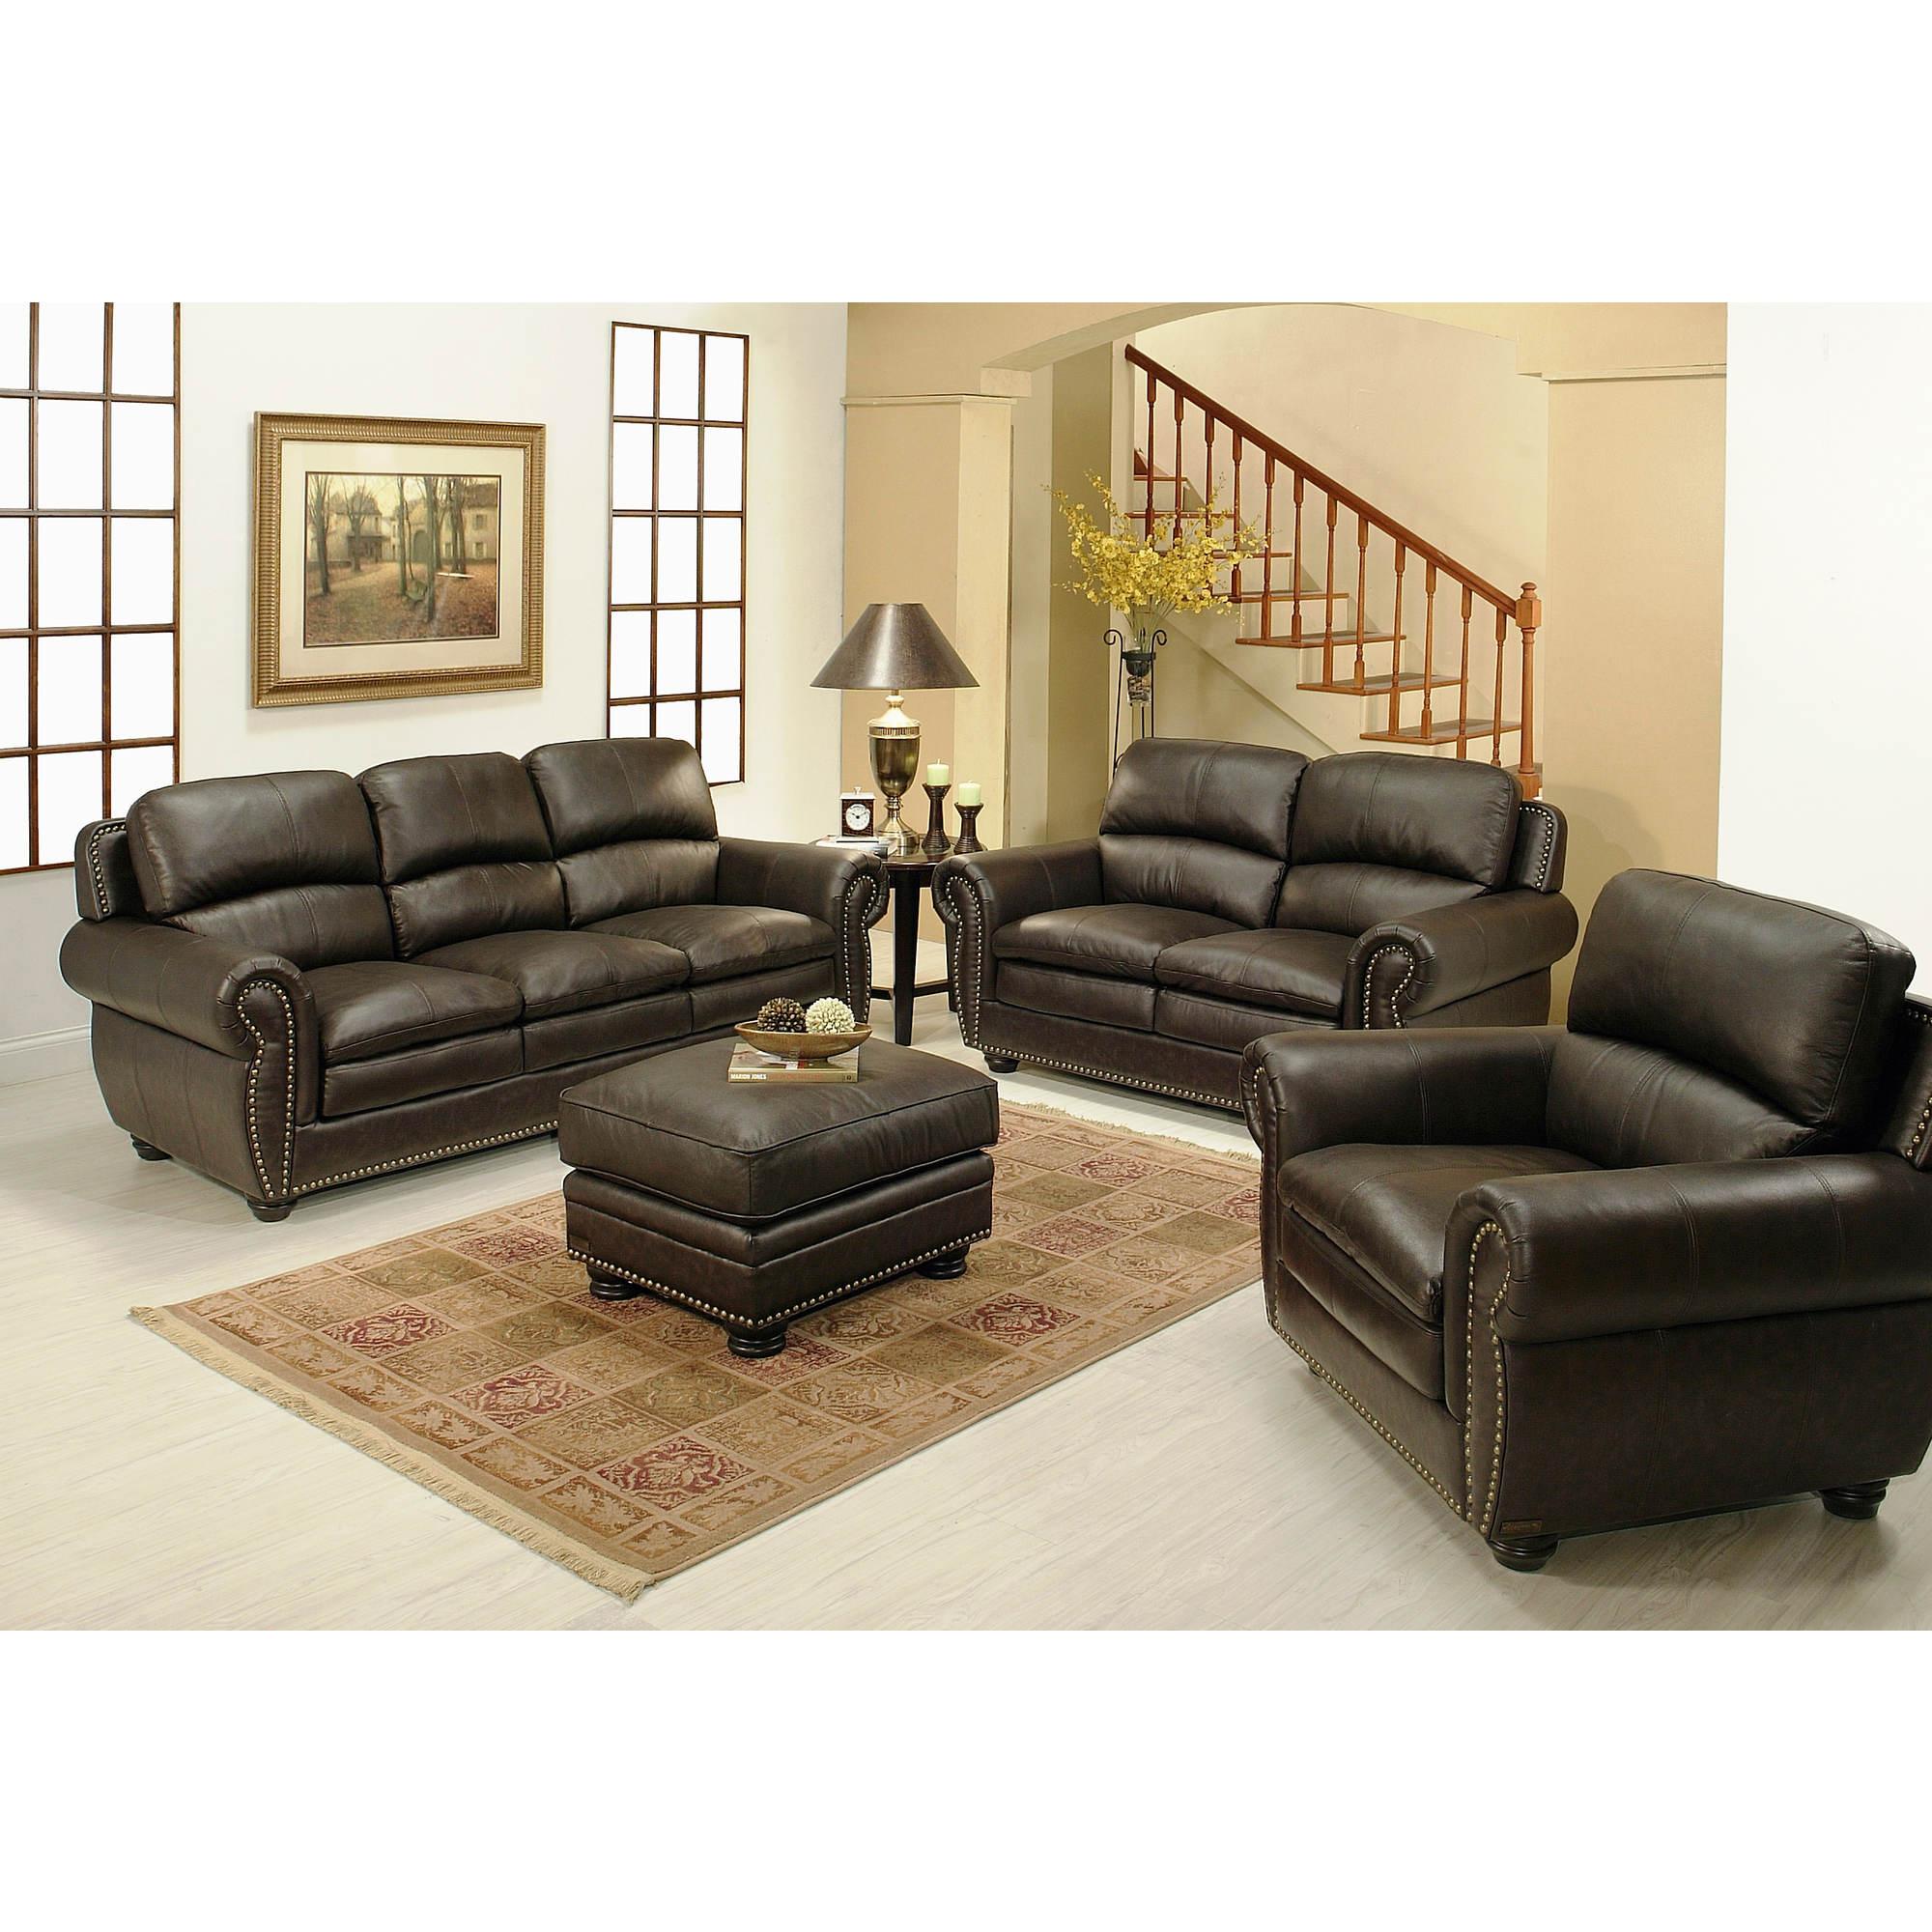 Abbyson Living Kingston 4-Pc. Leather Living Room Set